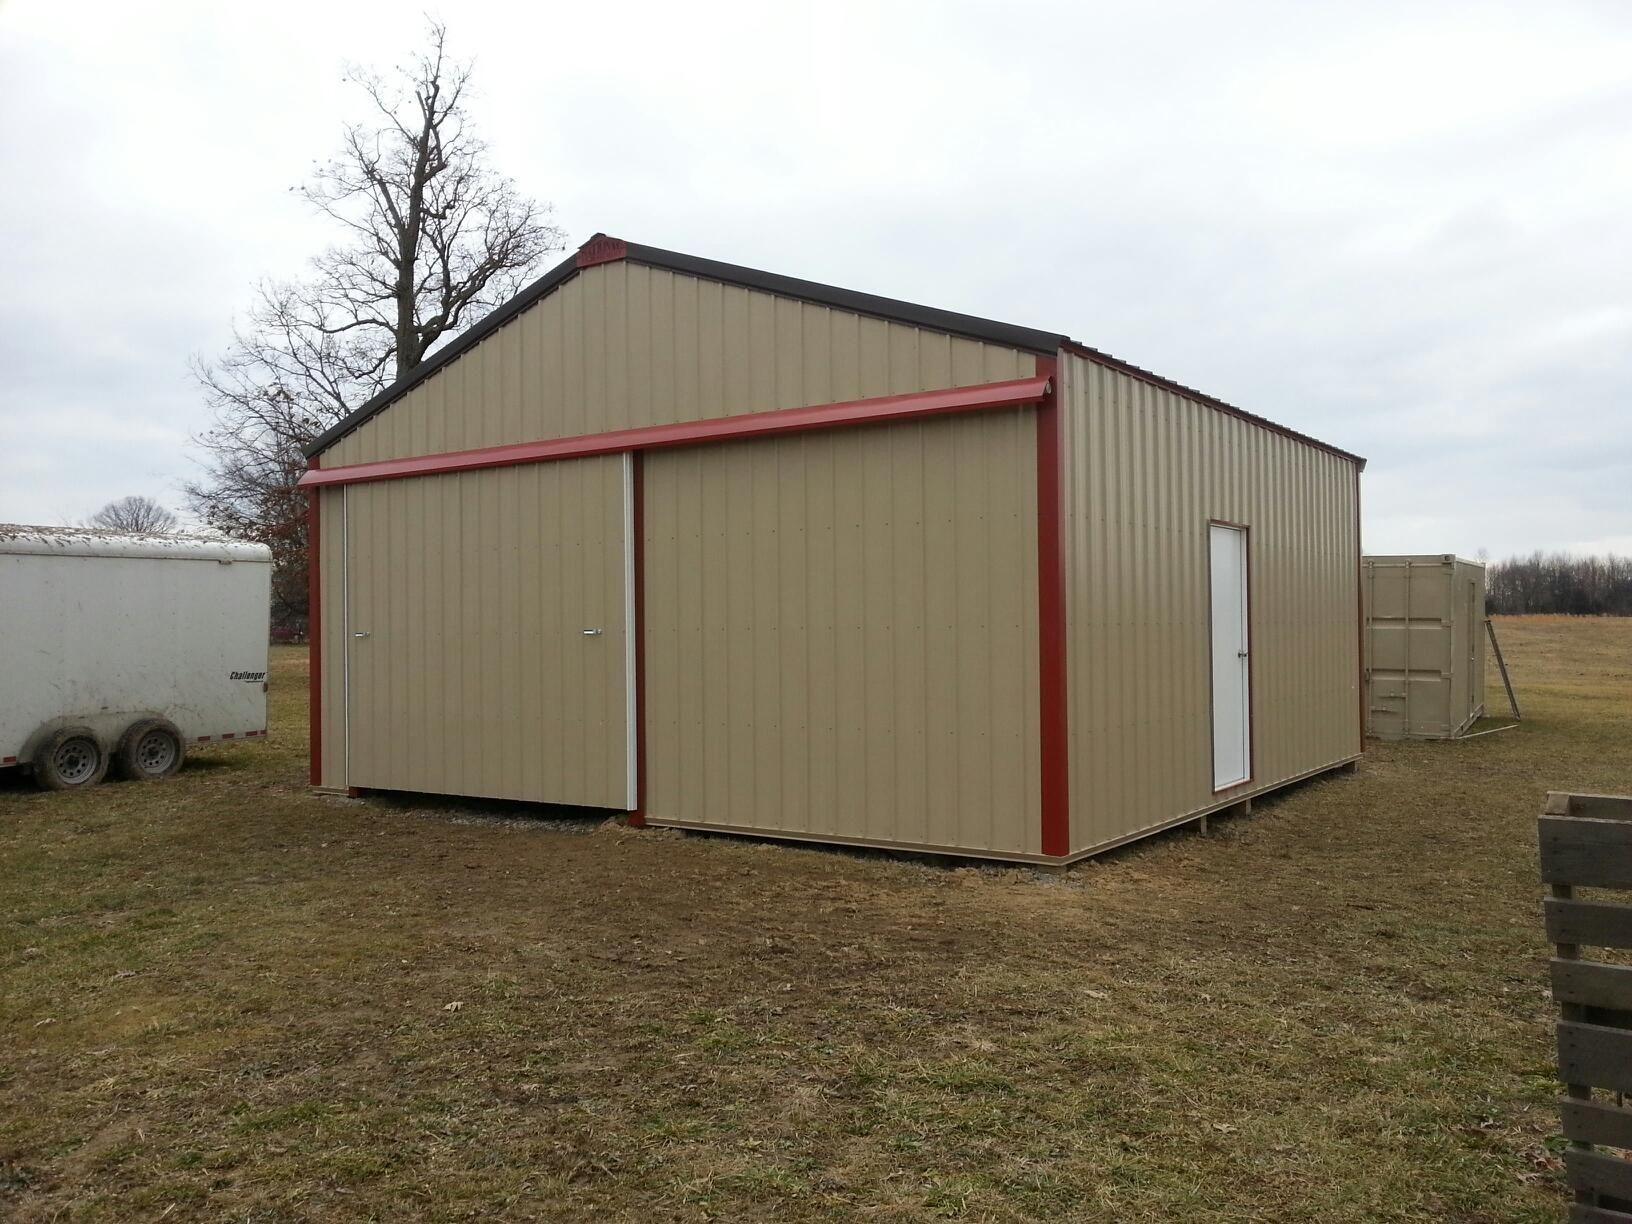 24x24x10 Pole Barn Www Nationalbarn Com Pole Barn Post Frame Building Diy Pole Barn